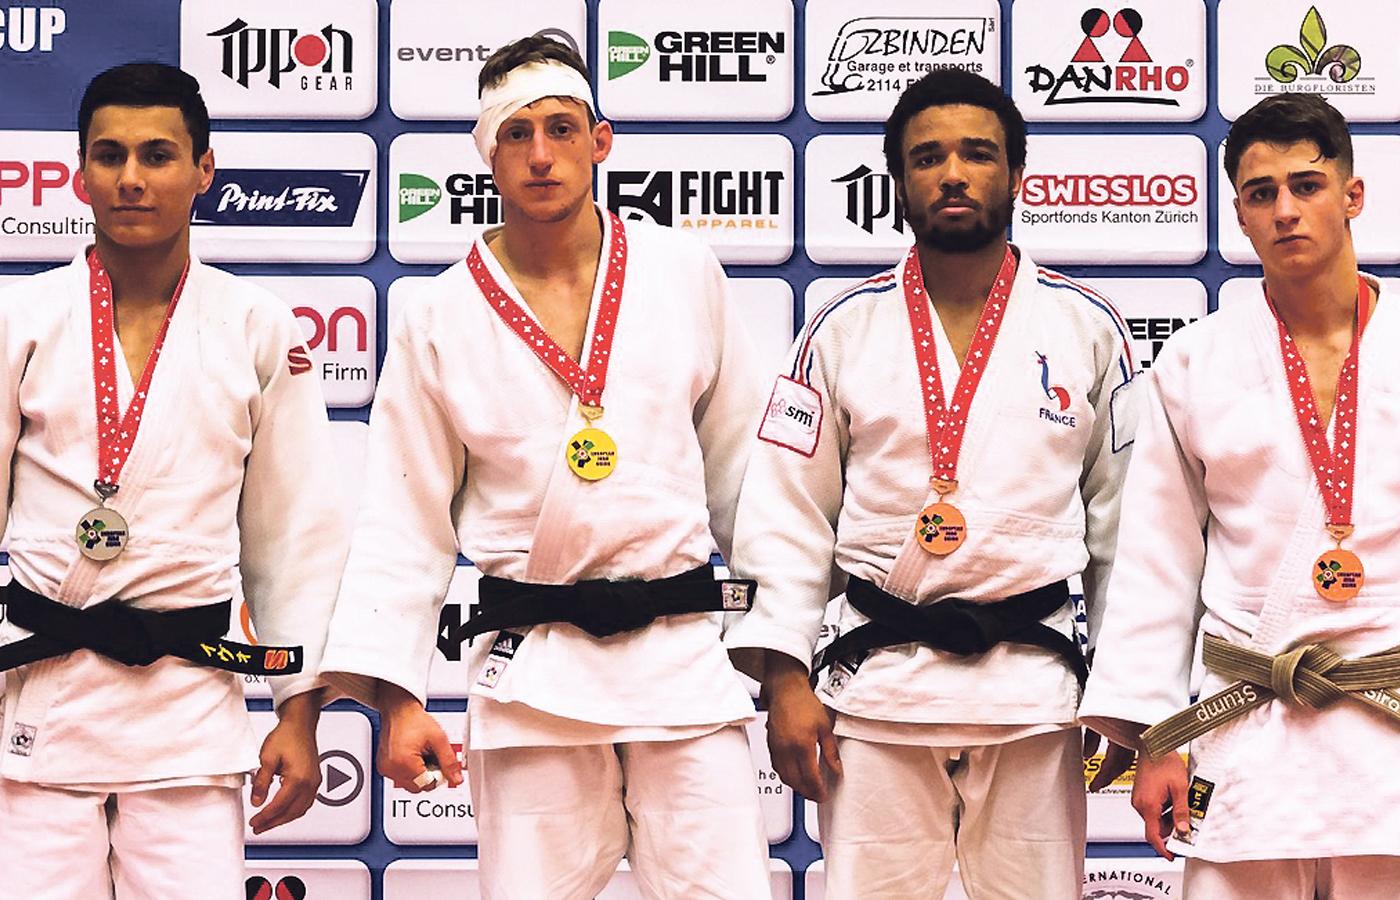 Adam-Batsiev-gewinnt-Bronze